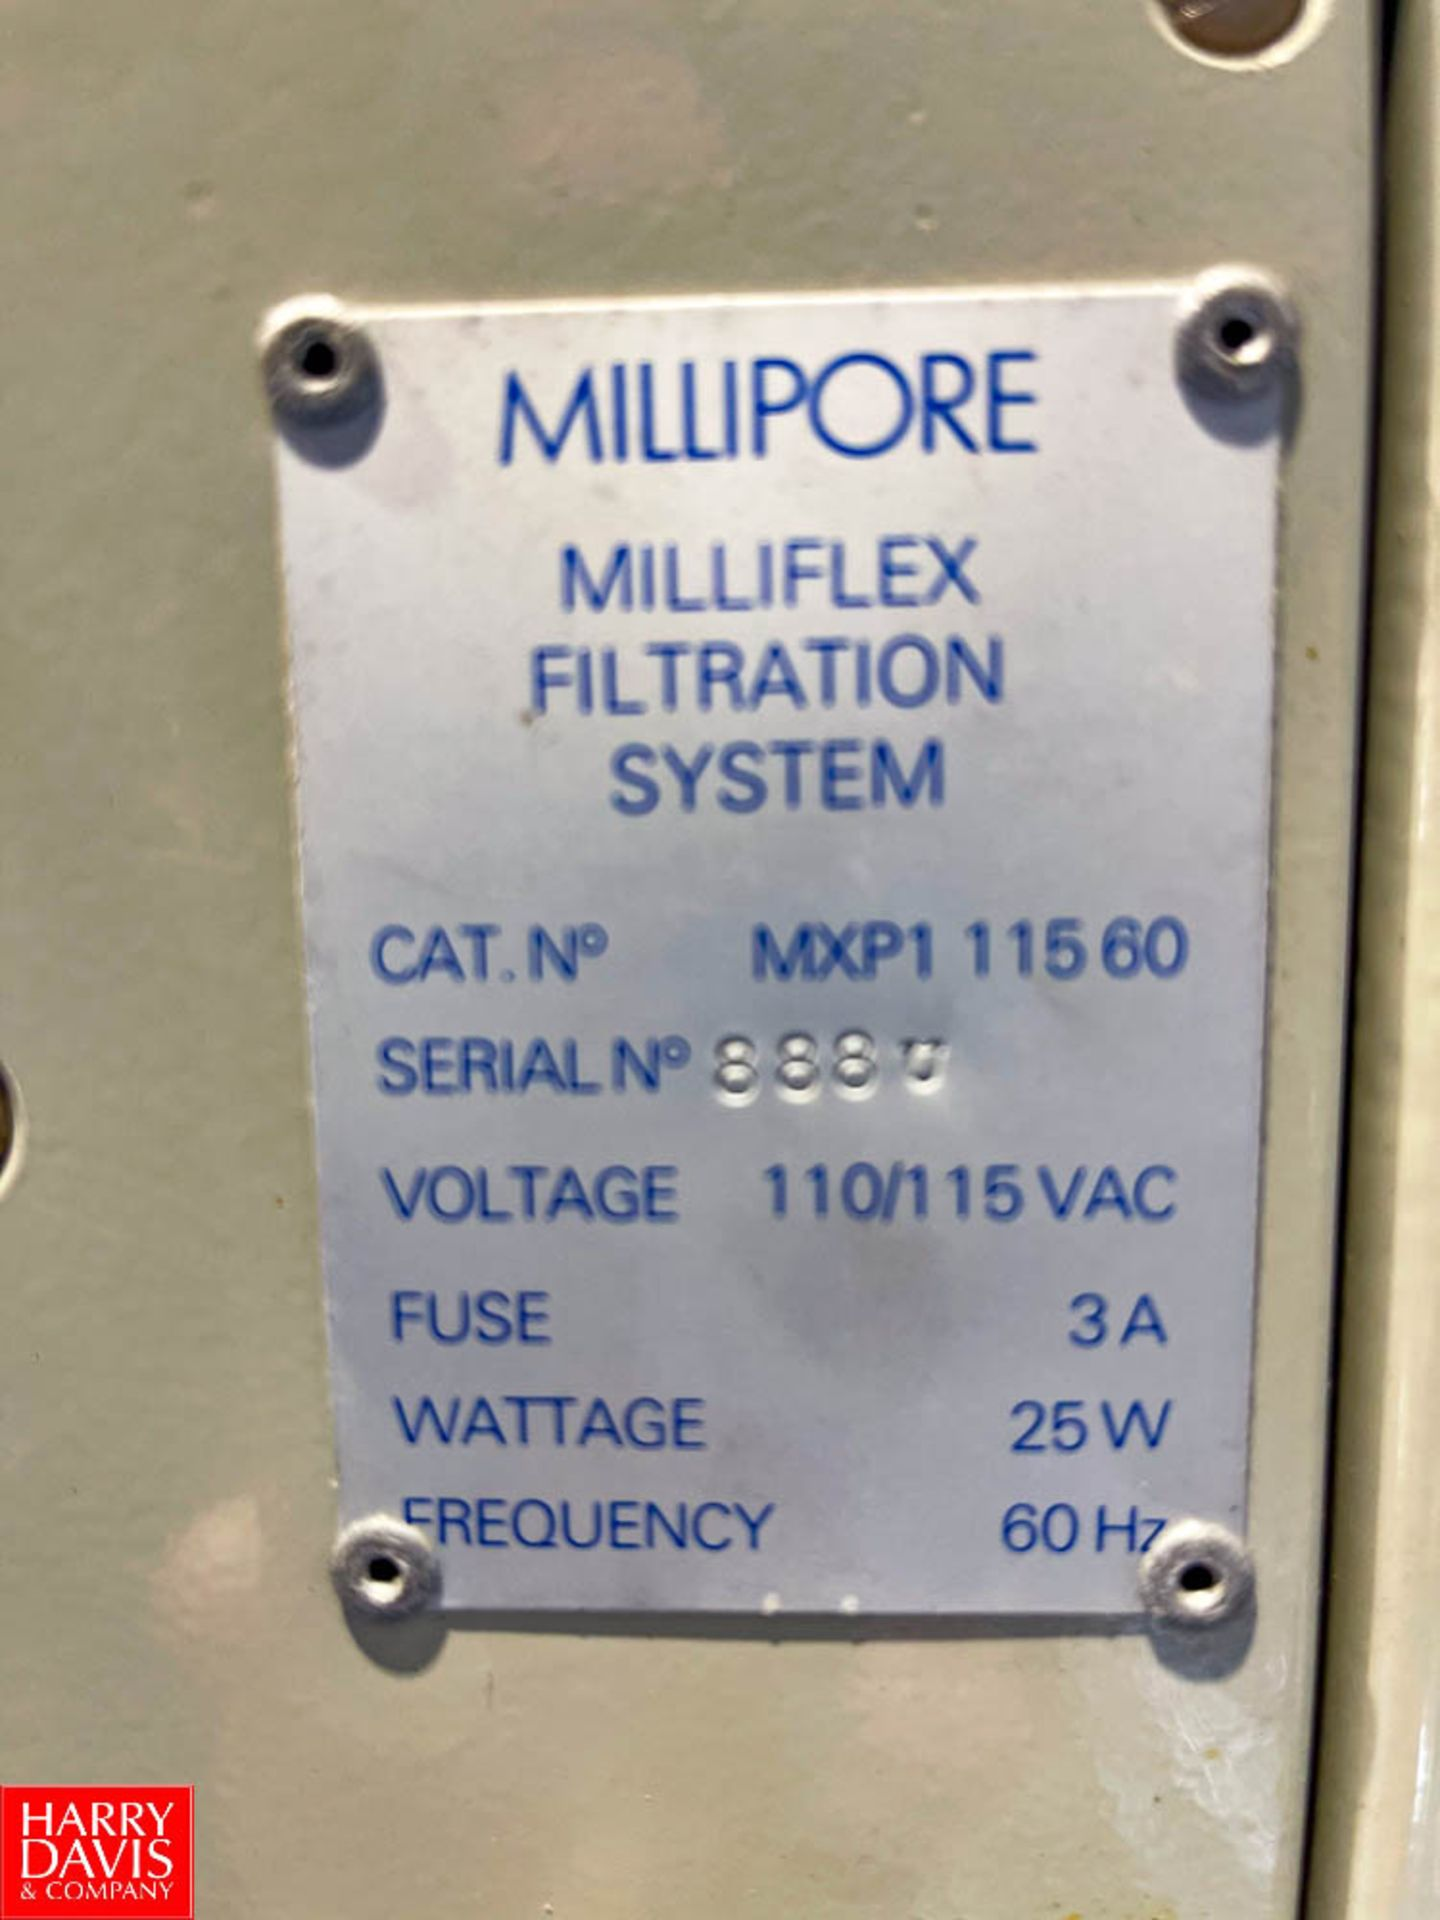 Millipore Milliflex Filtration System Model MXP1 11560, Single Head Pump - Image 2 of 2